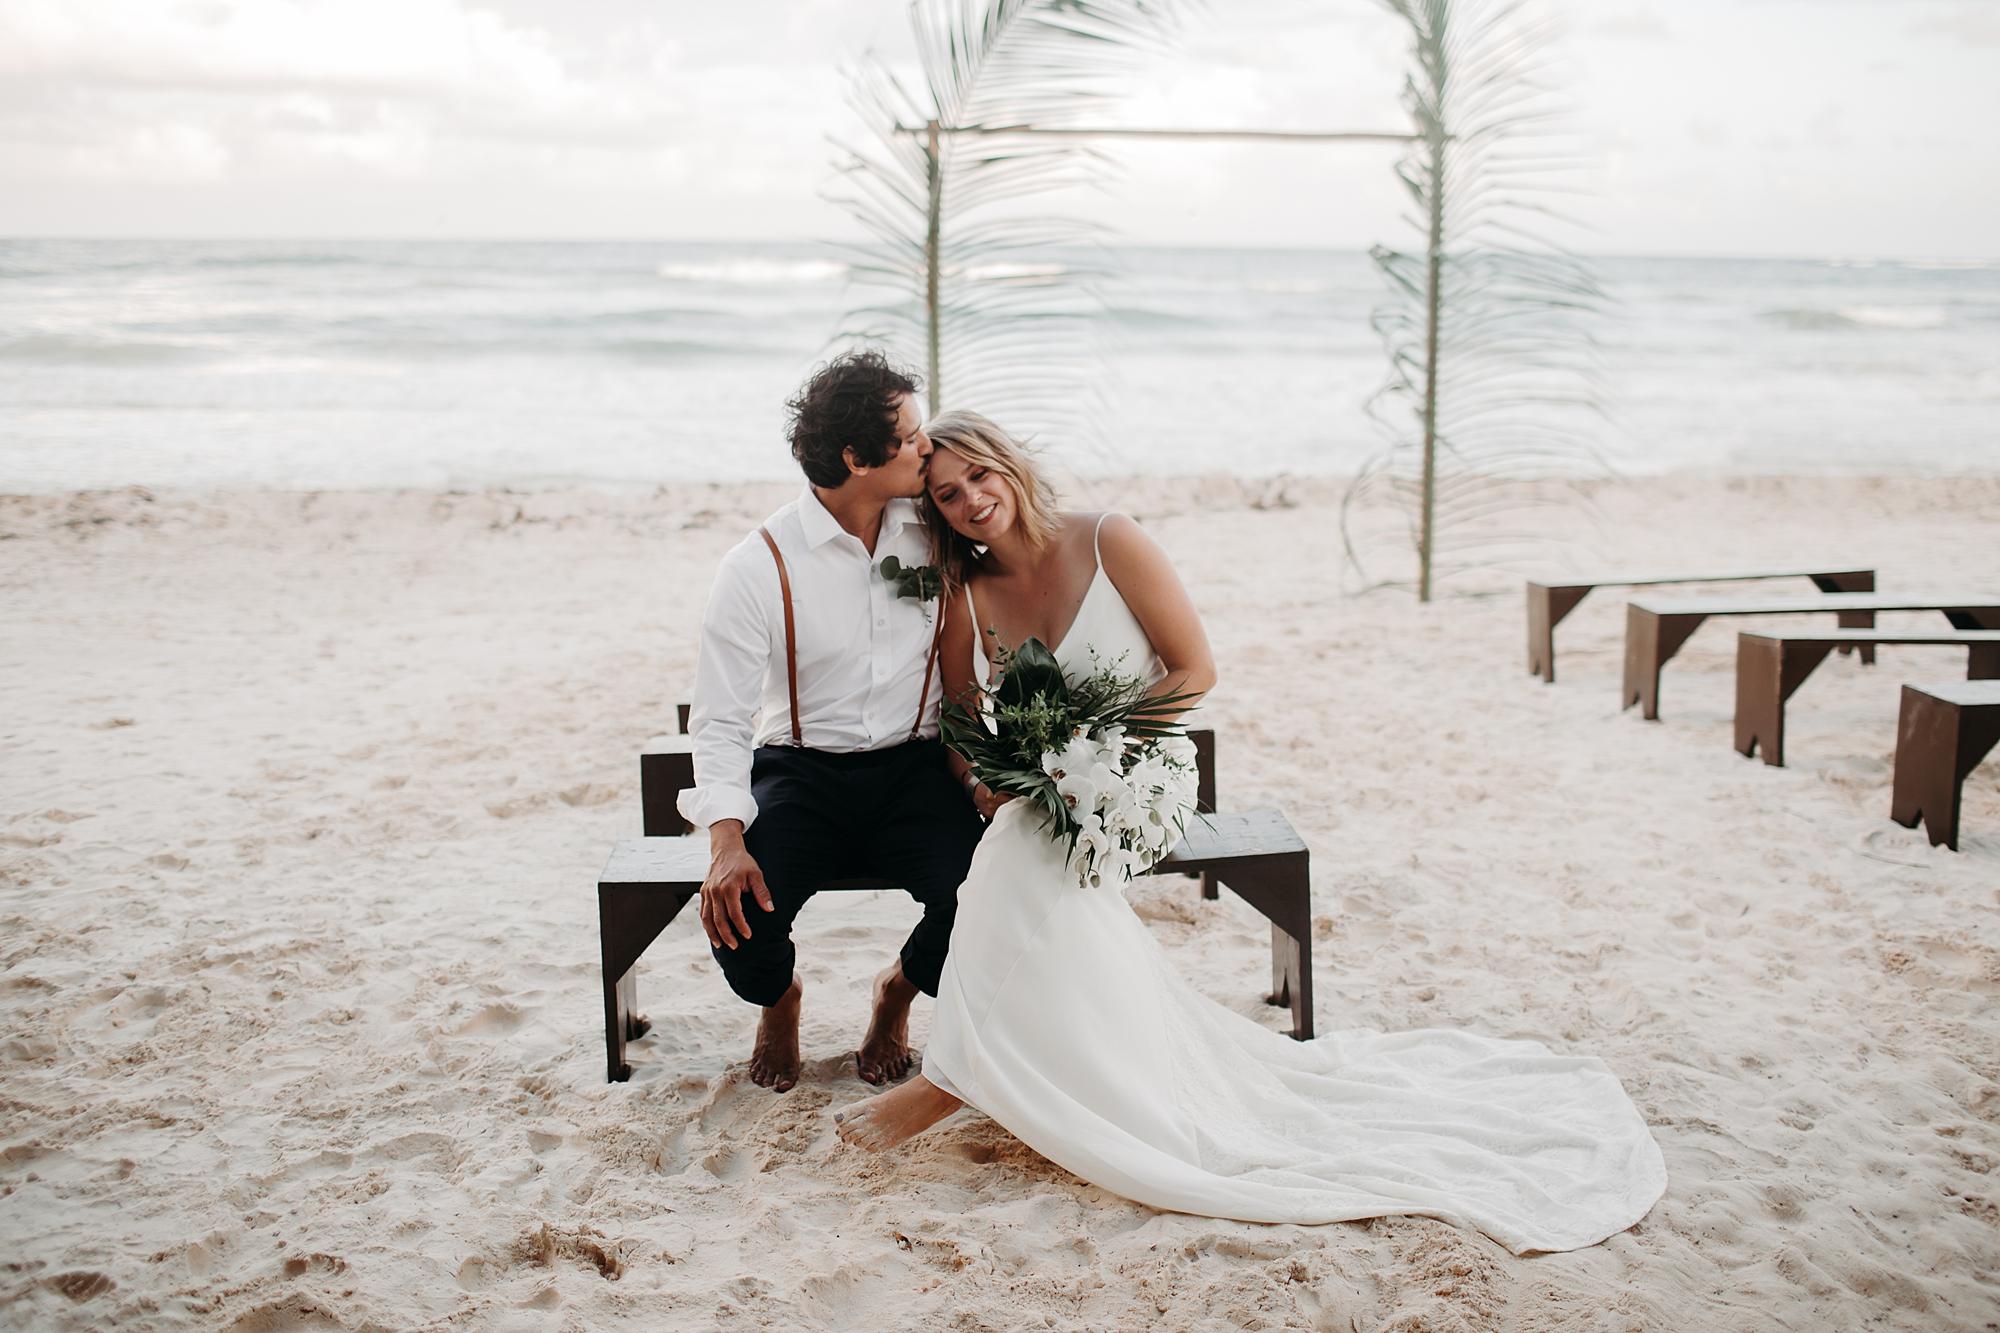 Danielle-San-Antonio-Wedding-Photographer-228_WEB.jpg